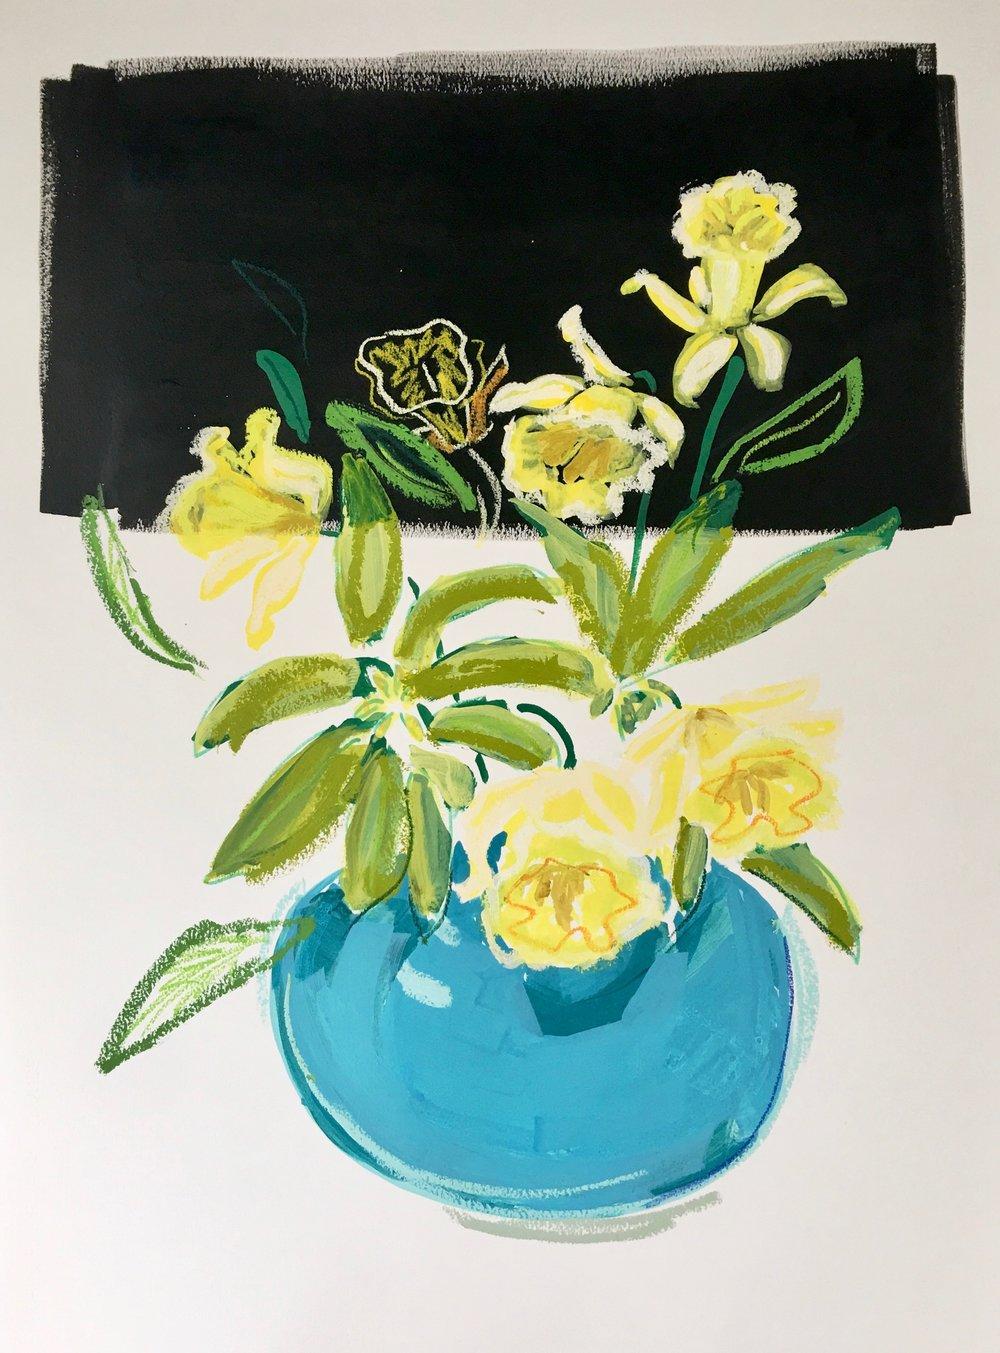 Daffodils in a Bowl I, 30x23